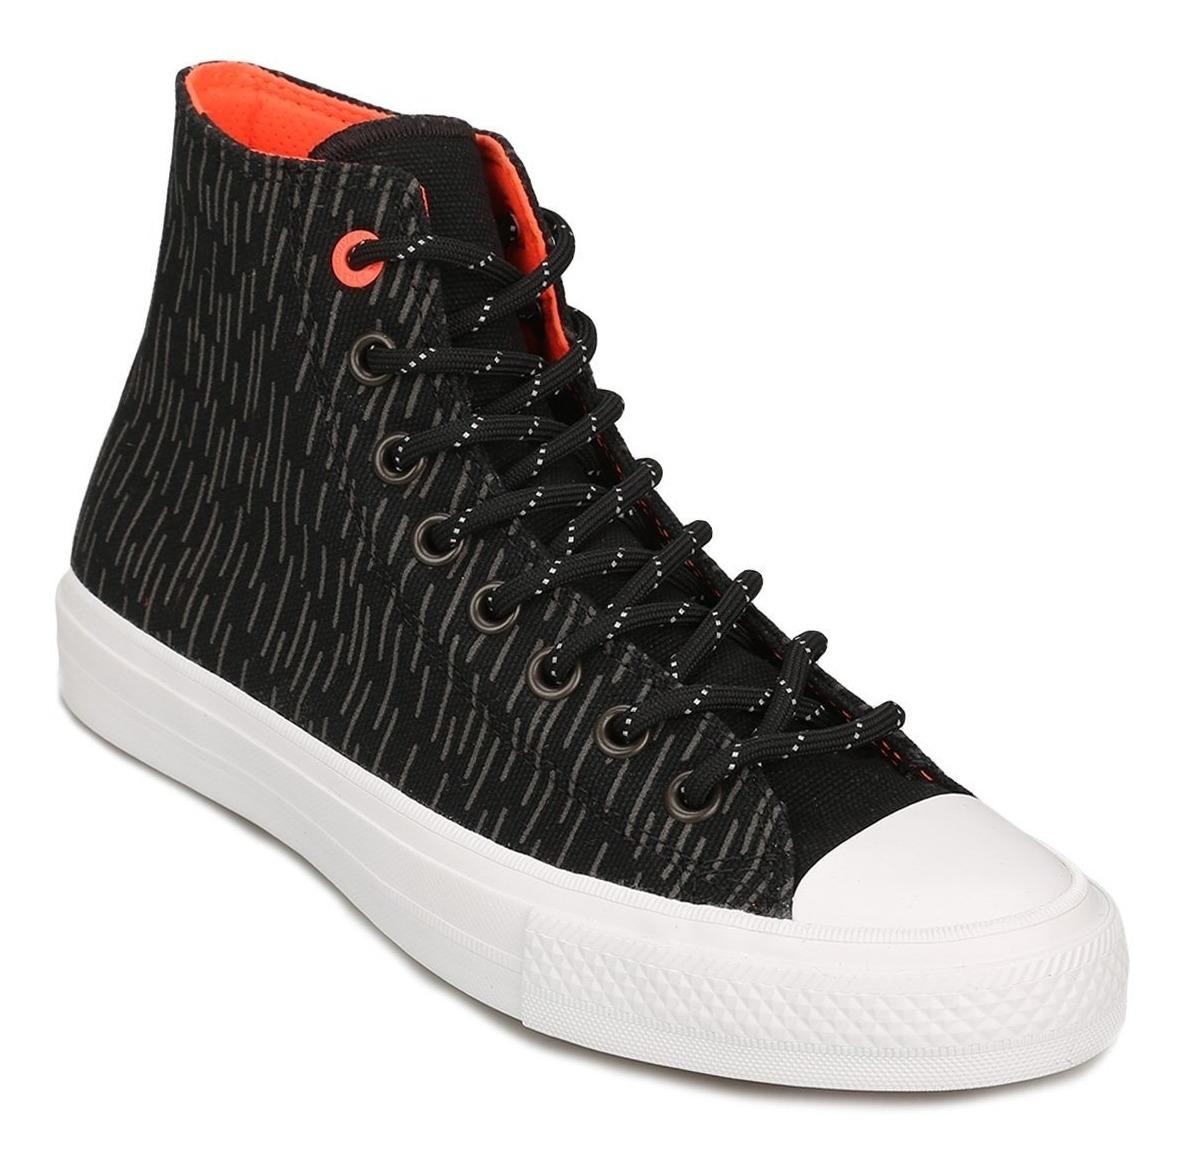 Zapatillas Converse Chuck Taylor All Star Ii Refle Hi Negro